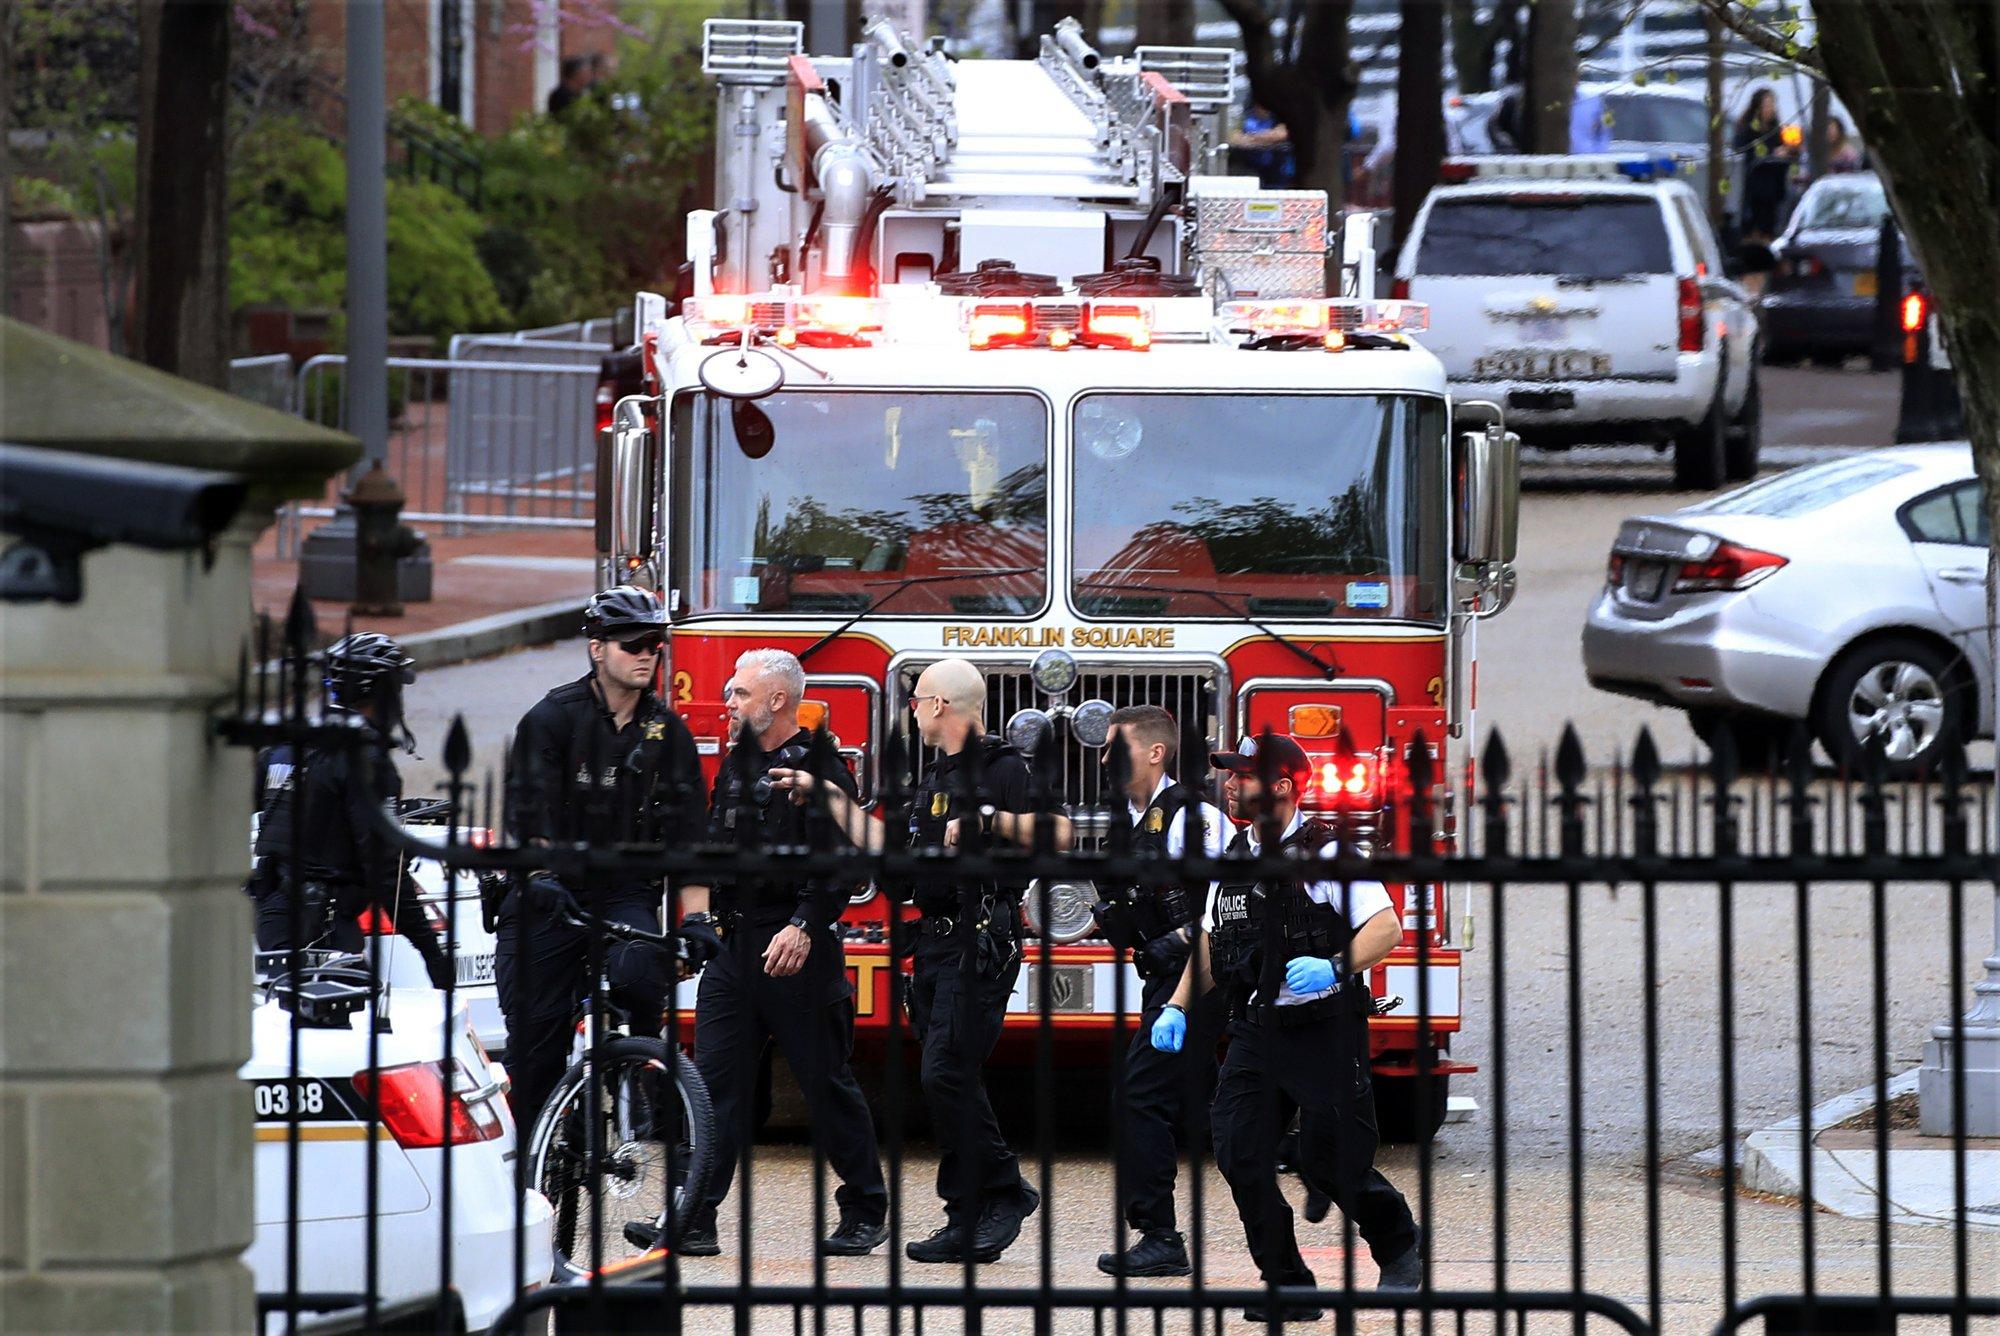 White House fire_1555101254110.jpeg.jpg